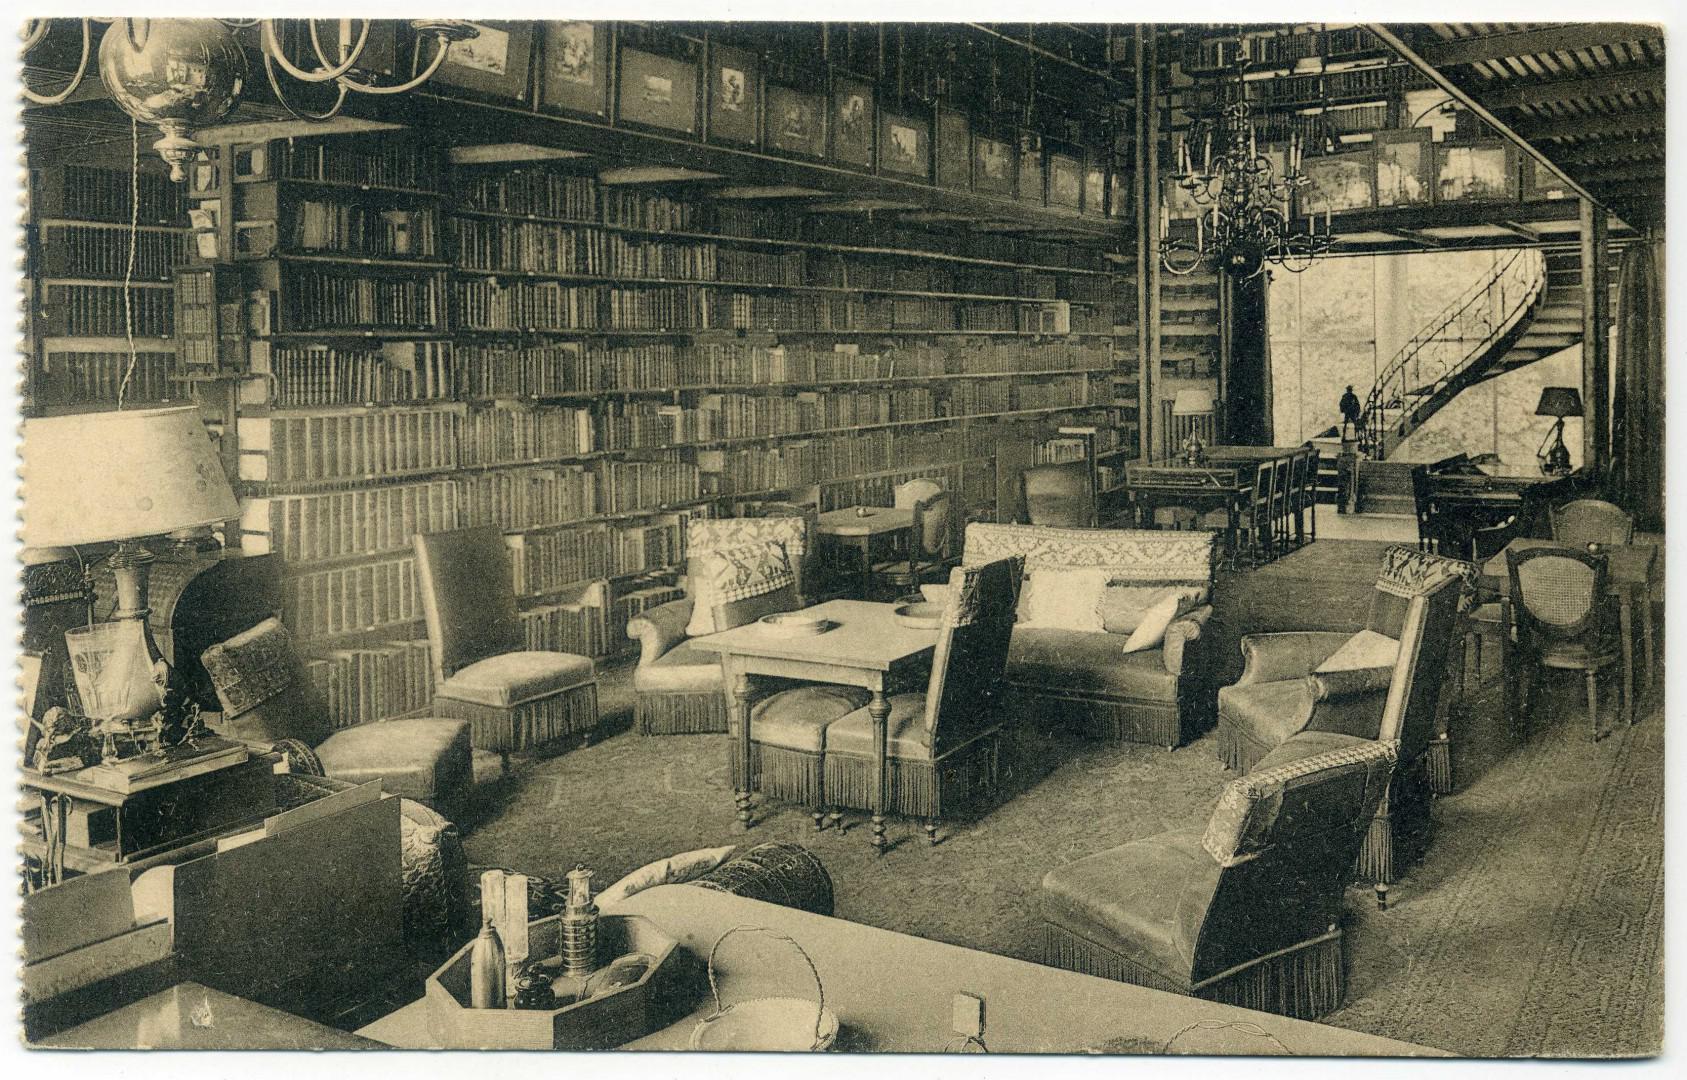 Morlanwelz: Schloß Mariemont - Bibliothek